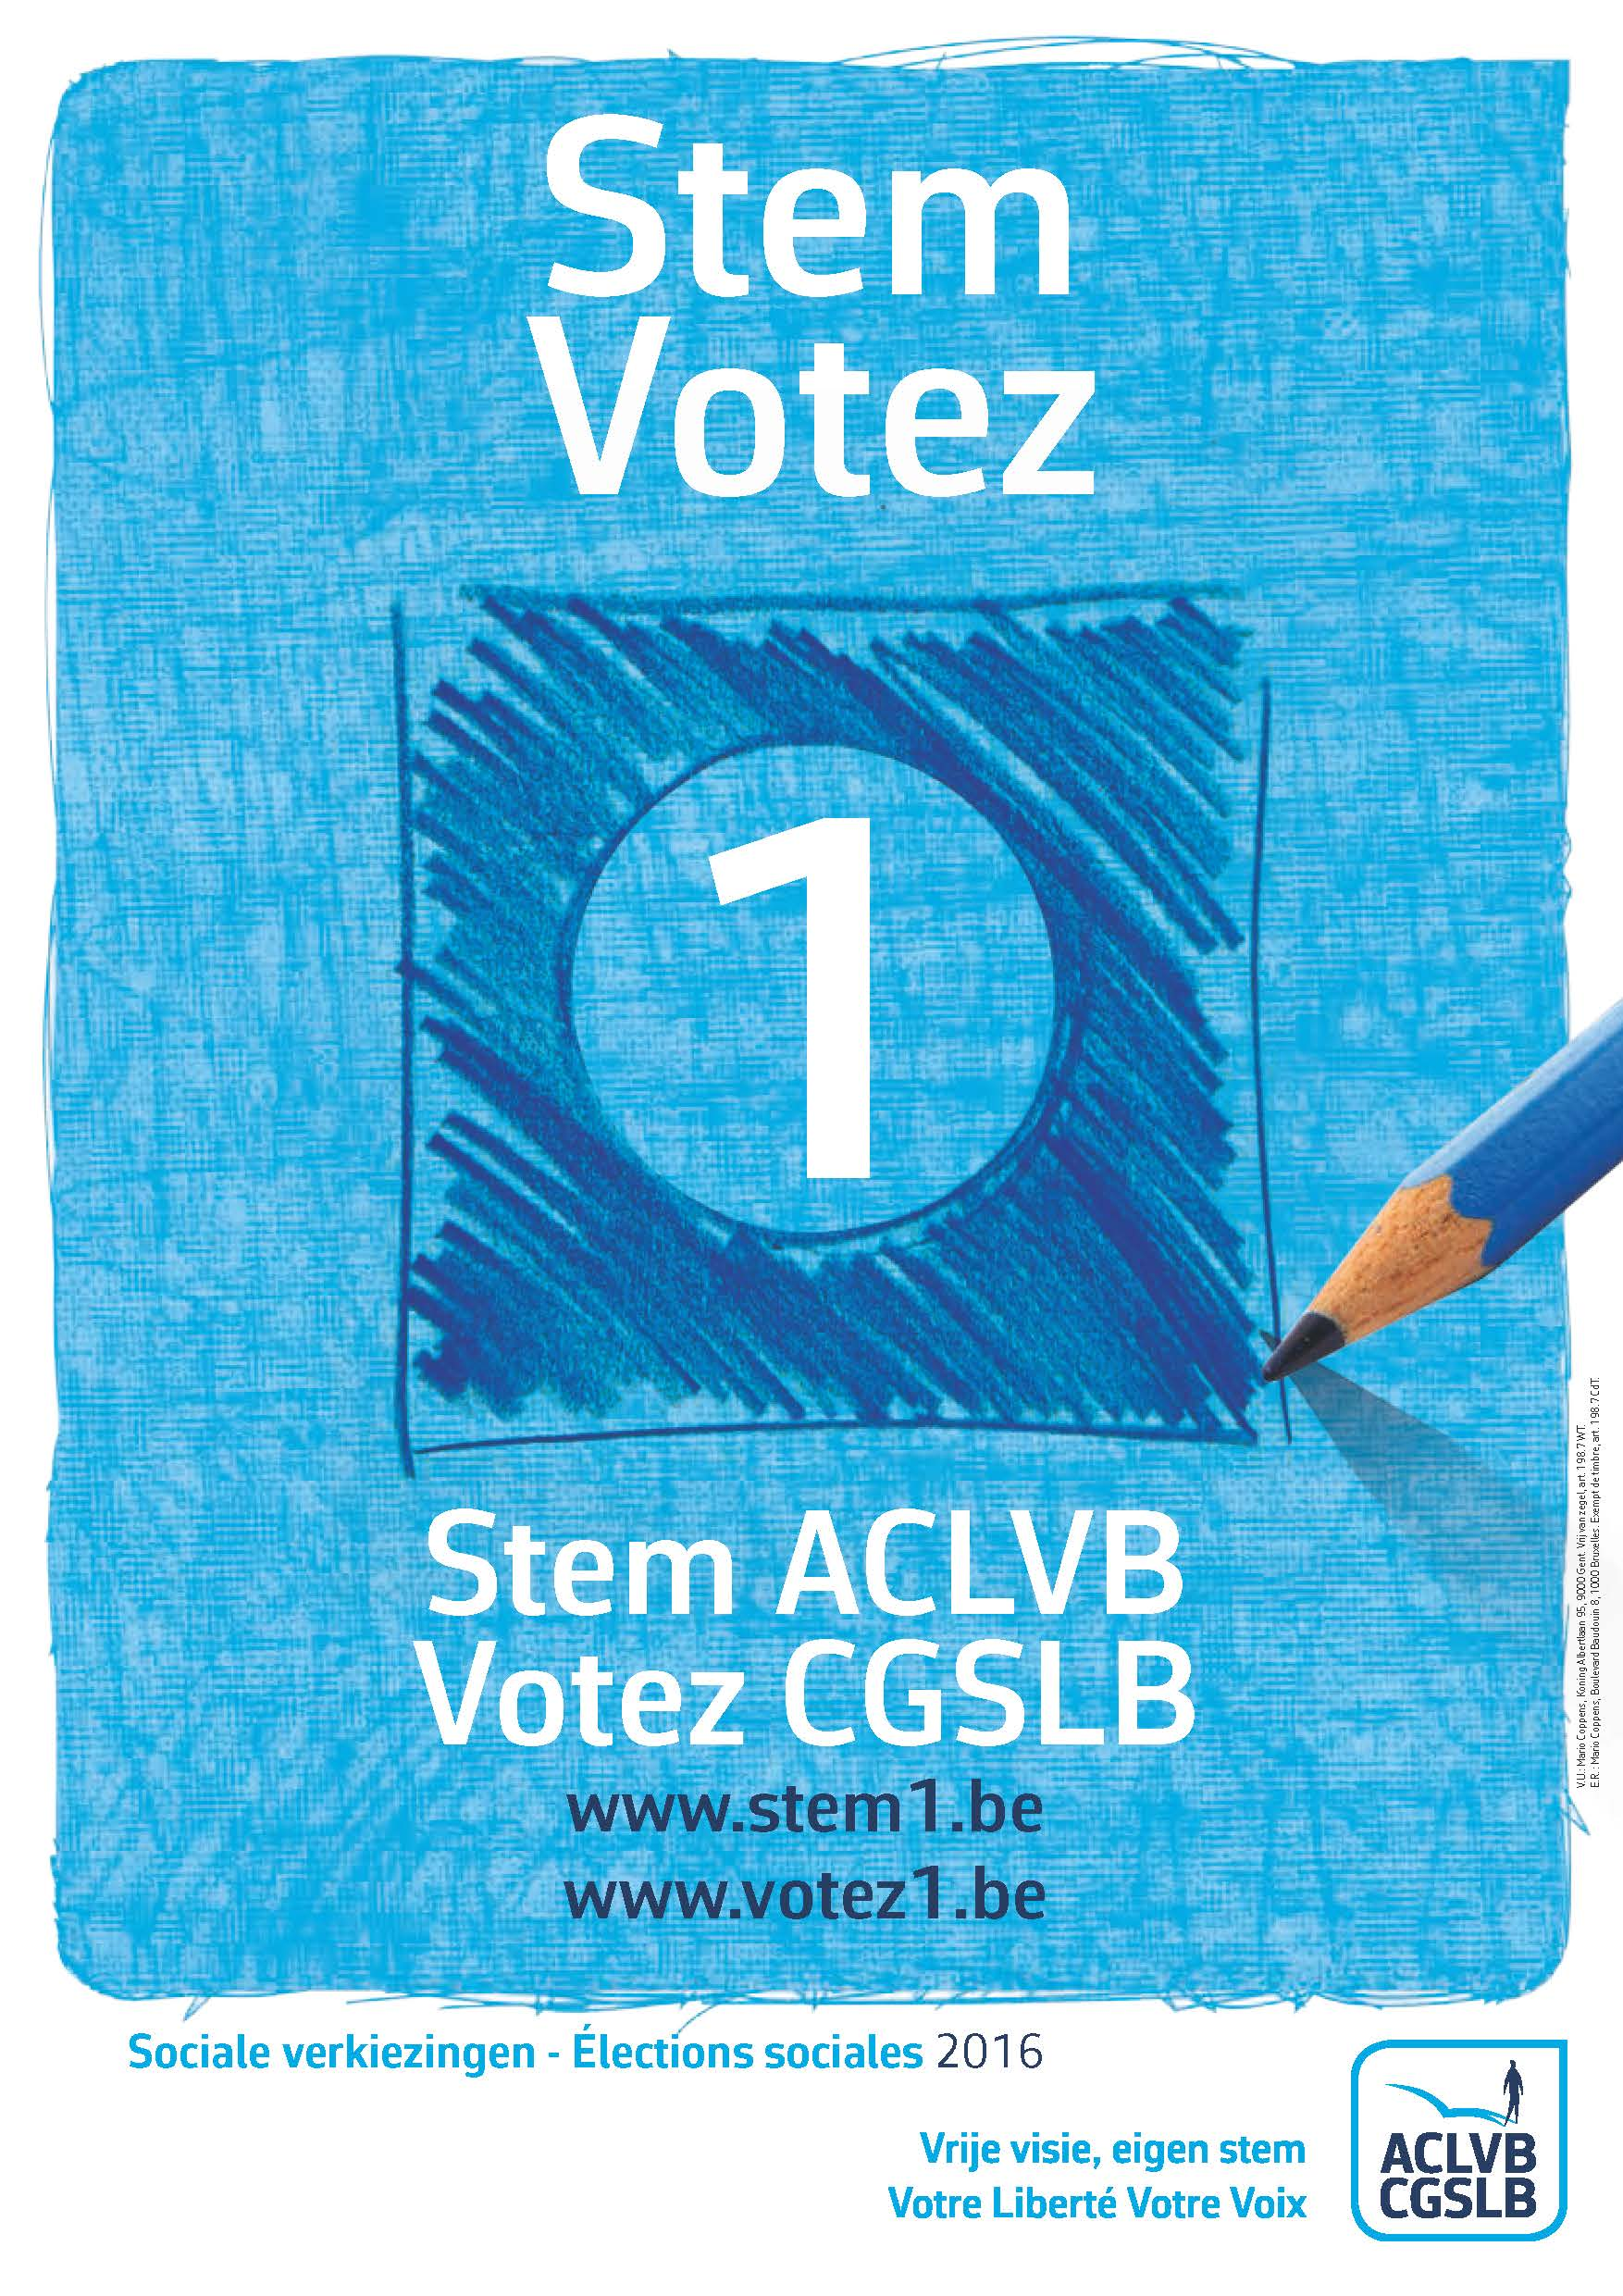 aclvb-so1987-affiches-stem1-nlfr-lores_0.jpg